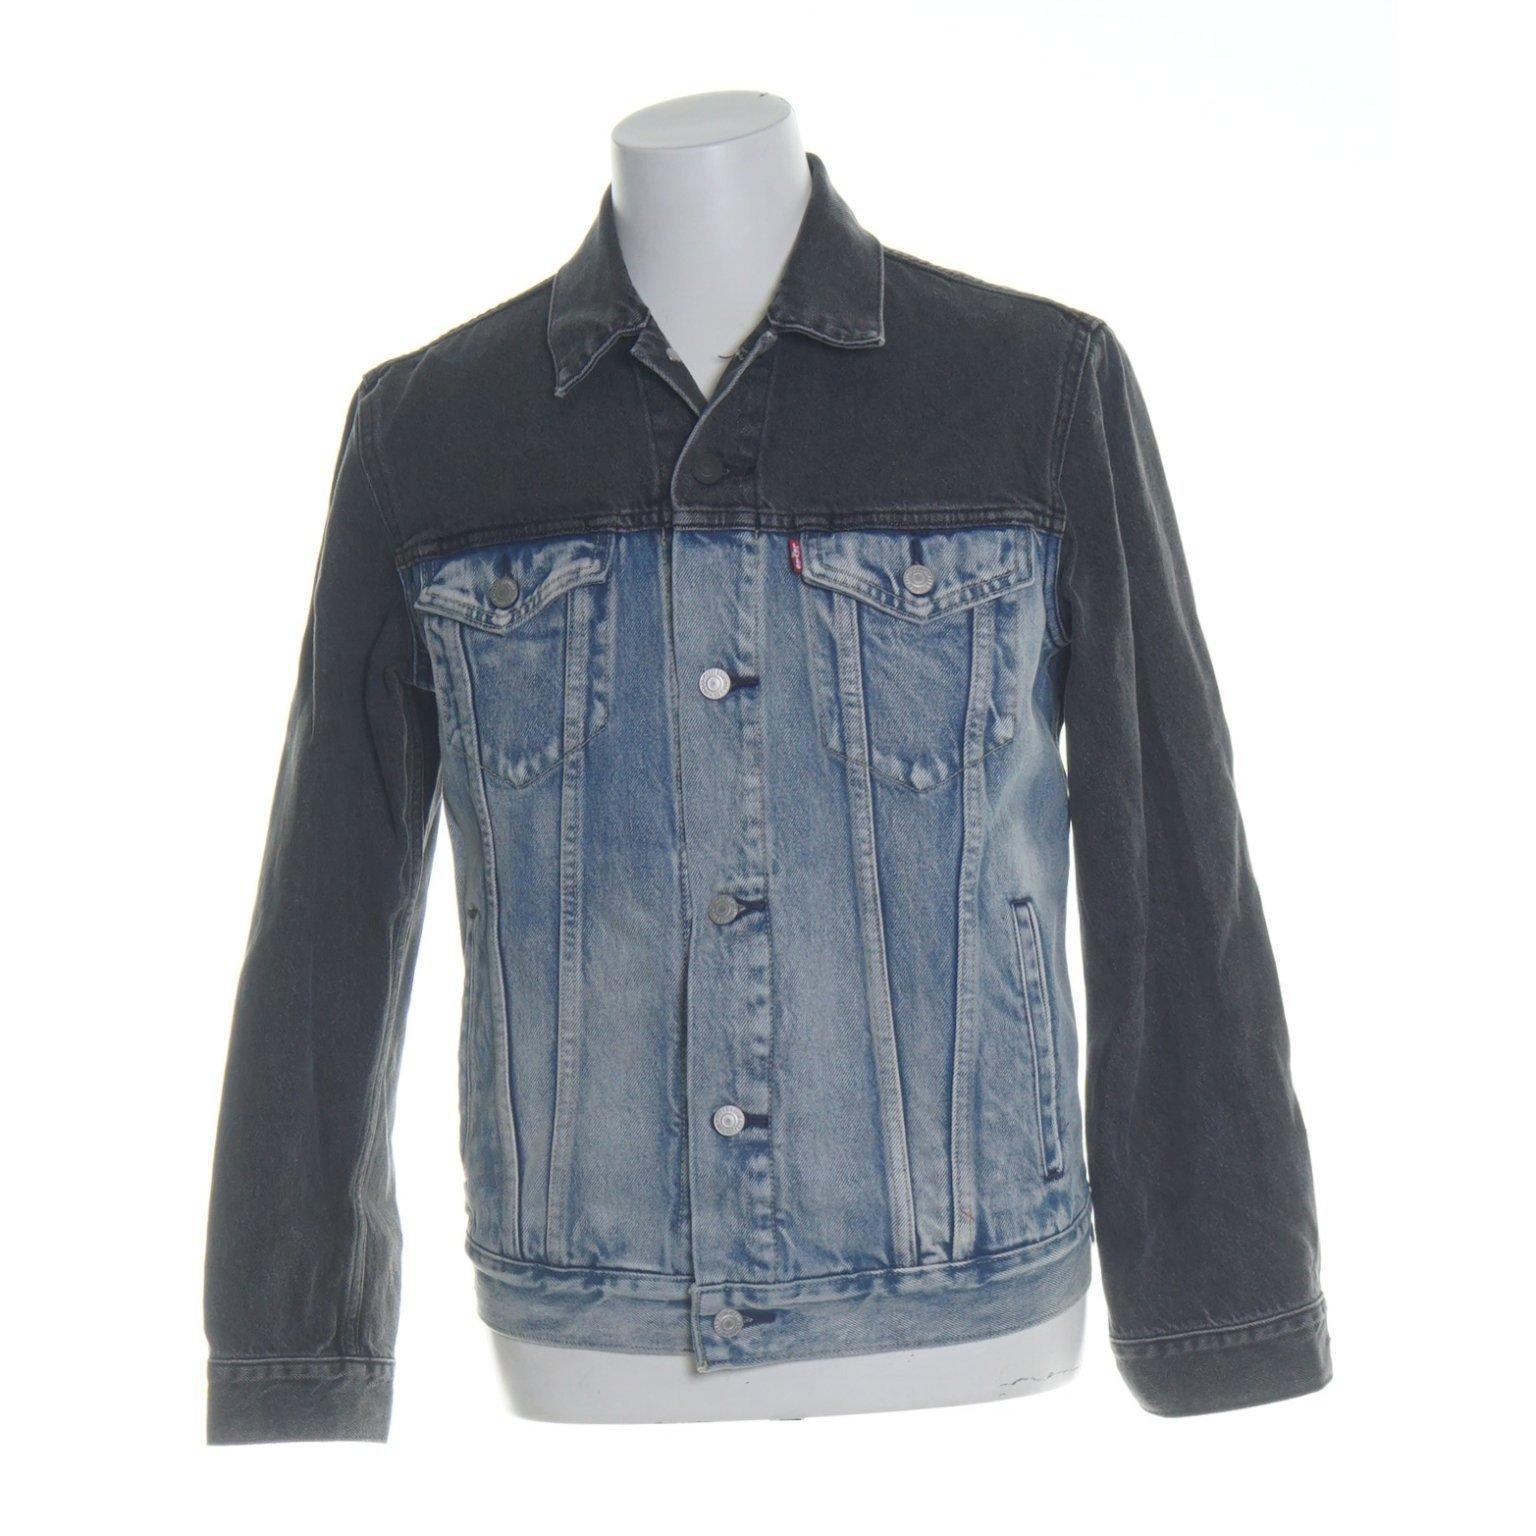 Levis trucker jeansjacka blå svart strl M (407276506) ᐈ Köp